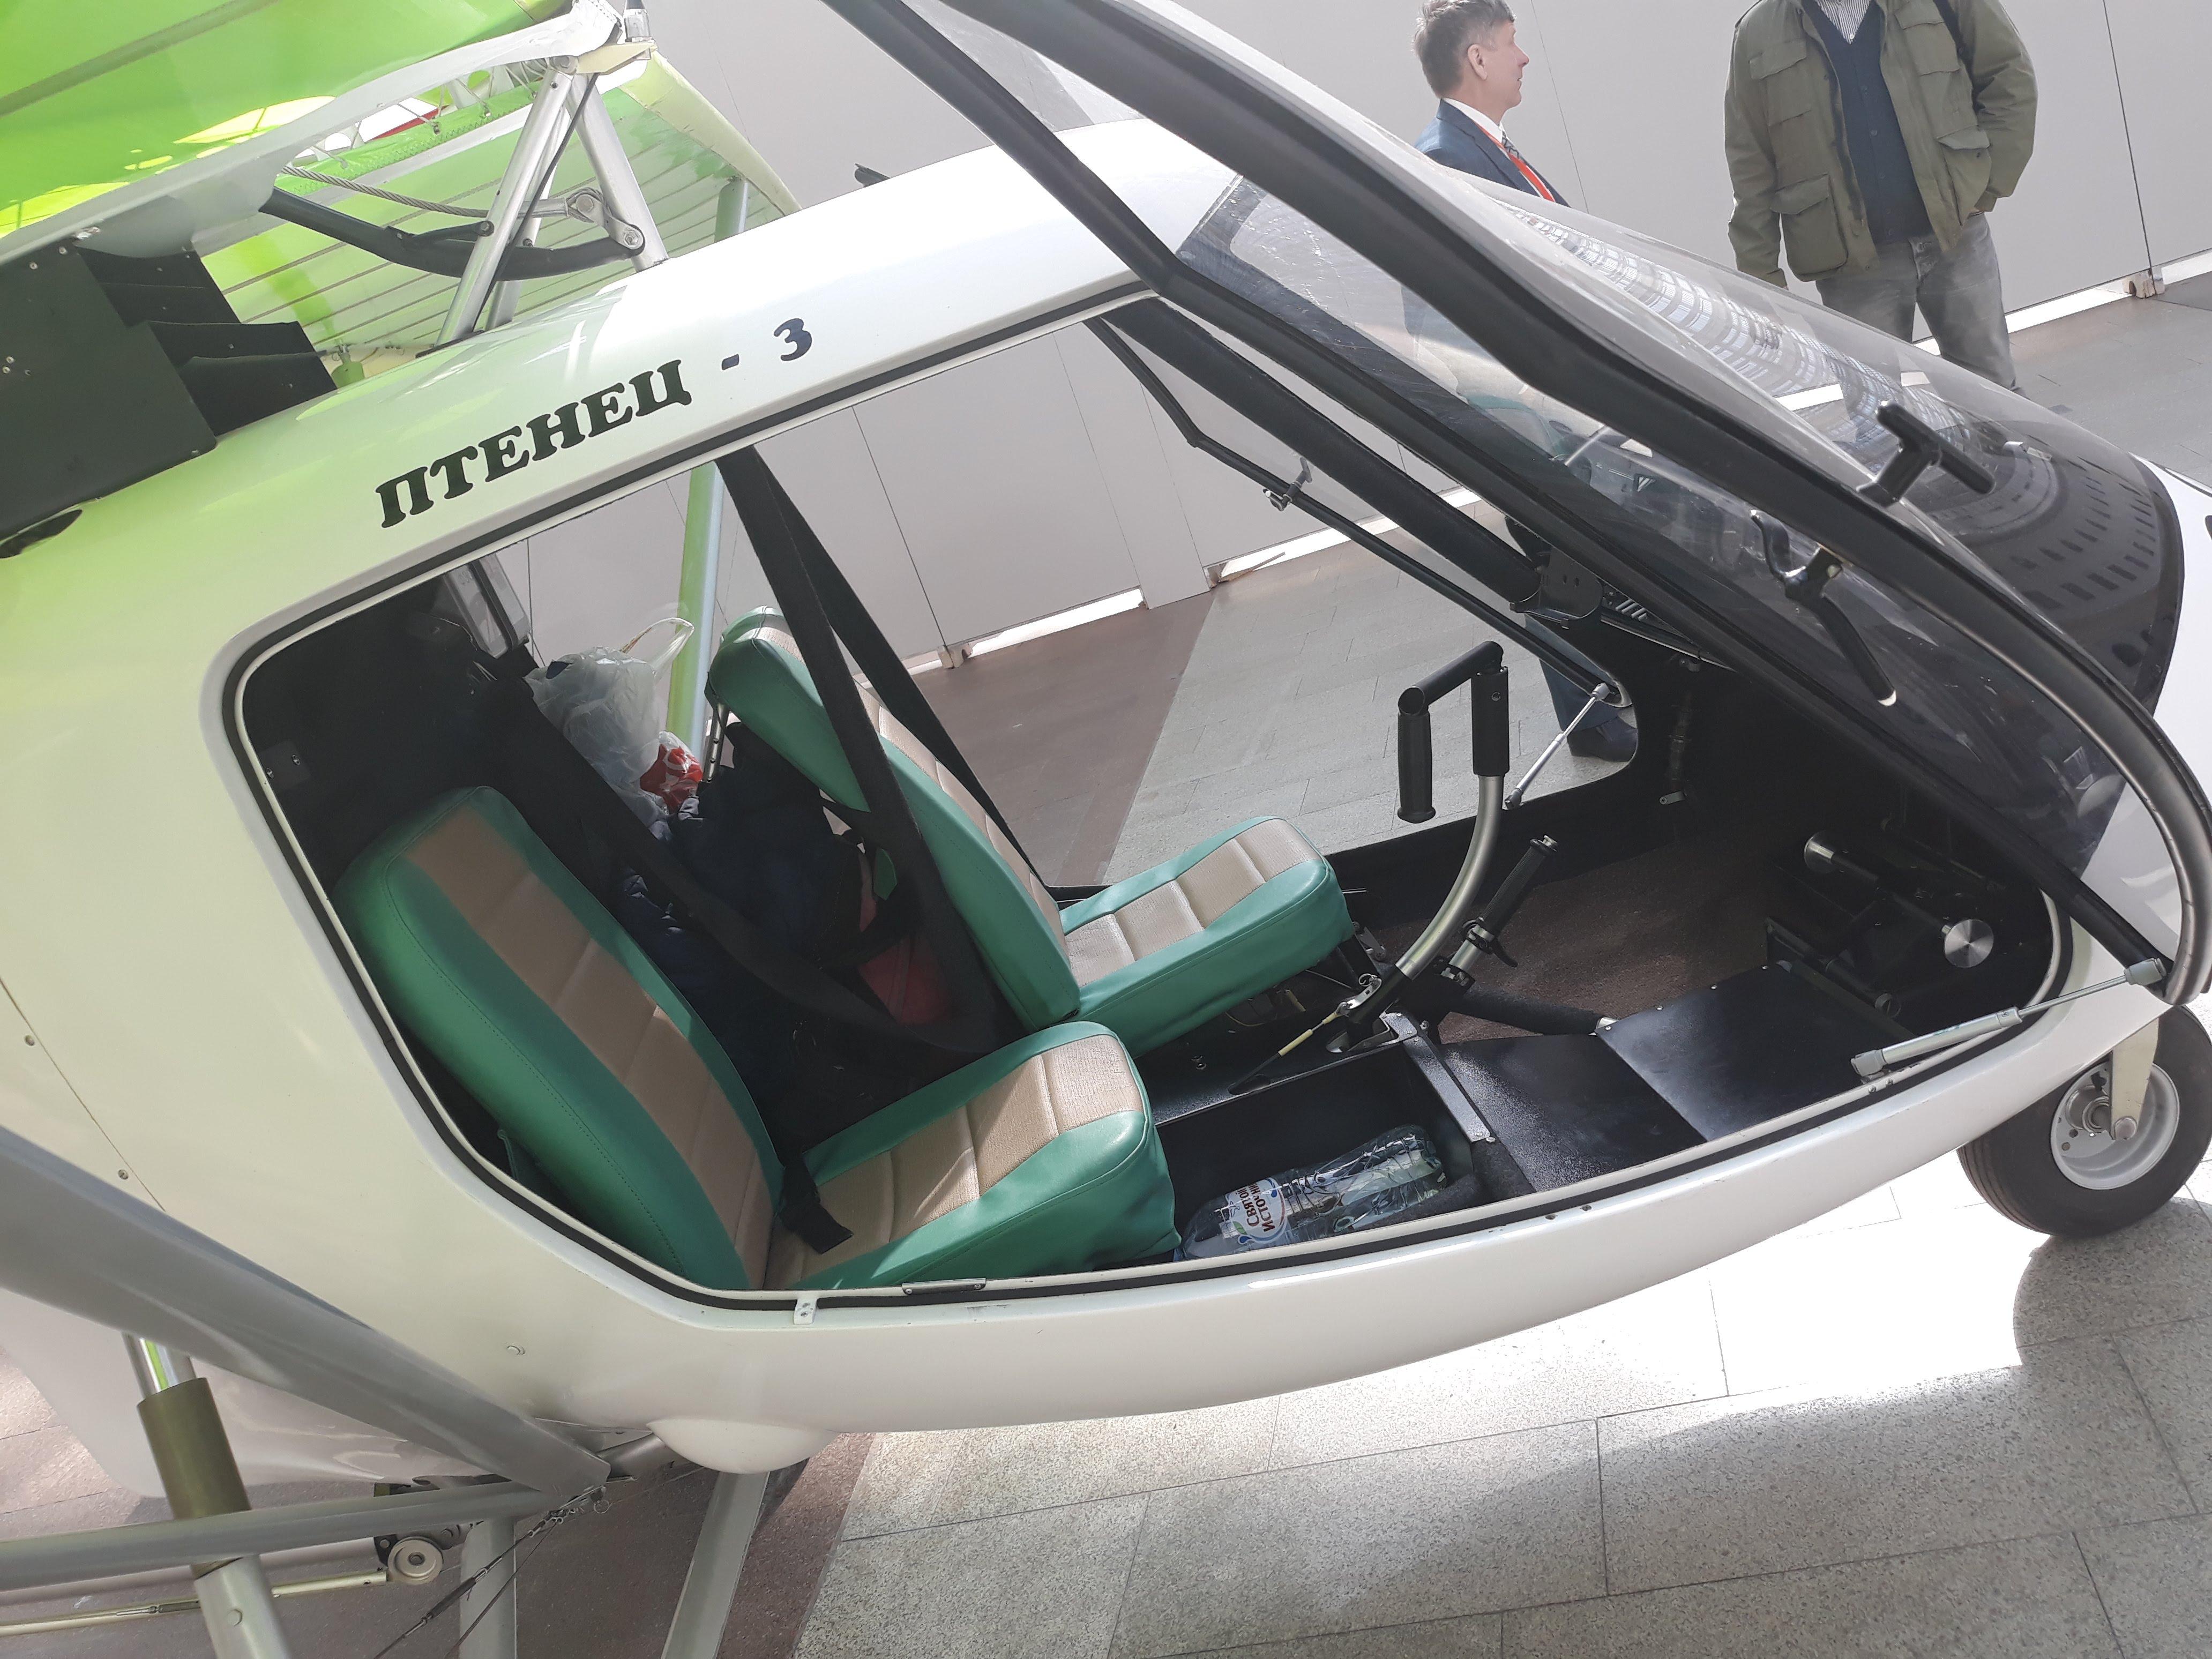 Салон самолёта Птенец-3